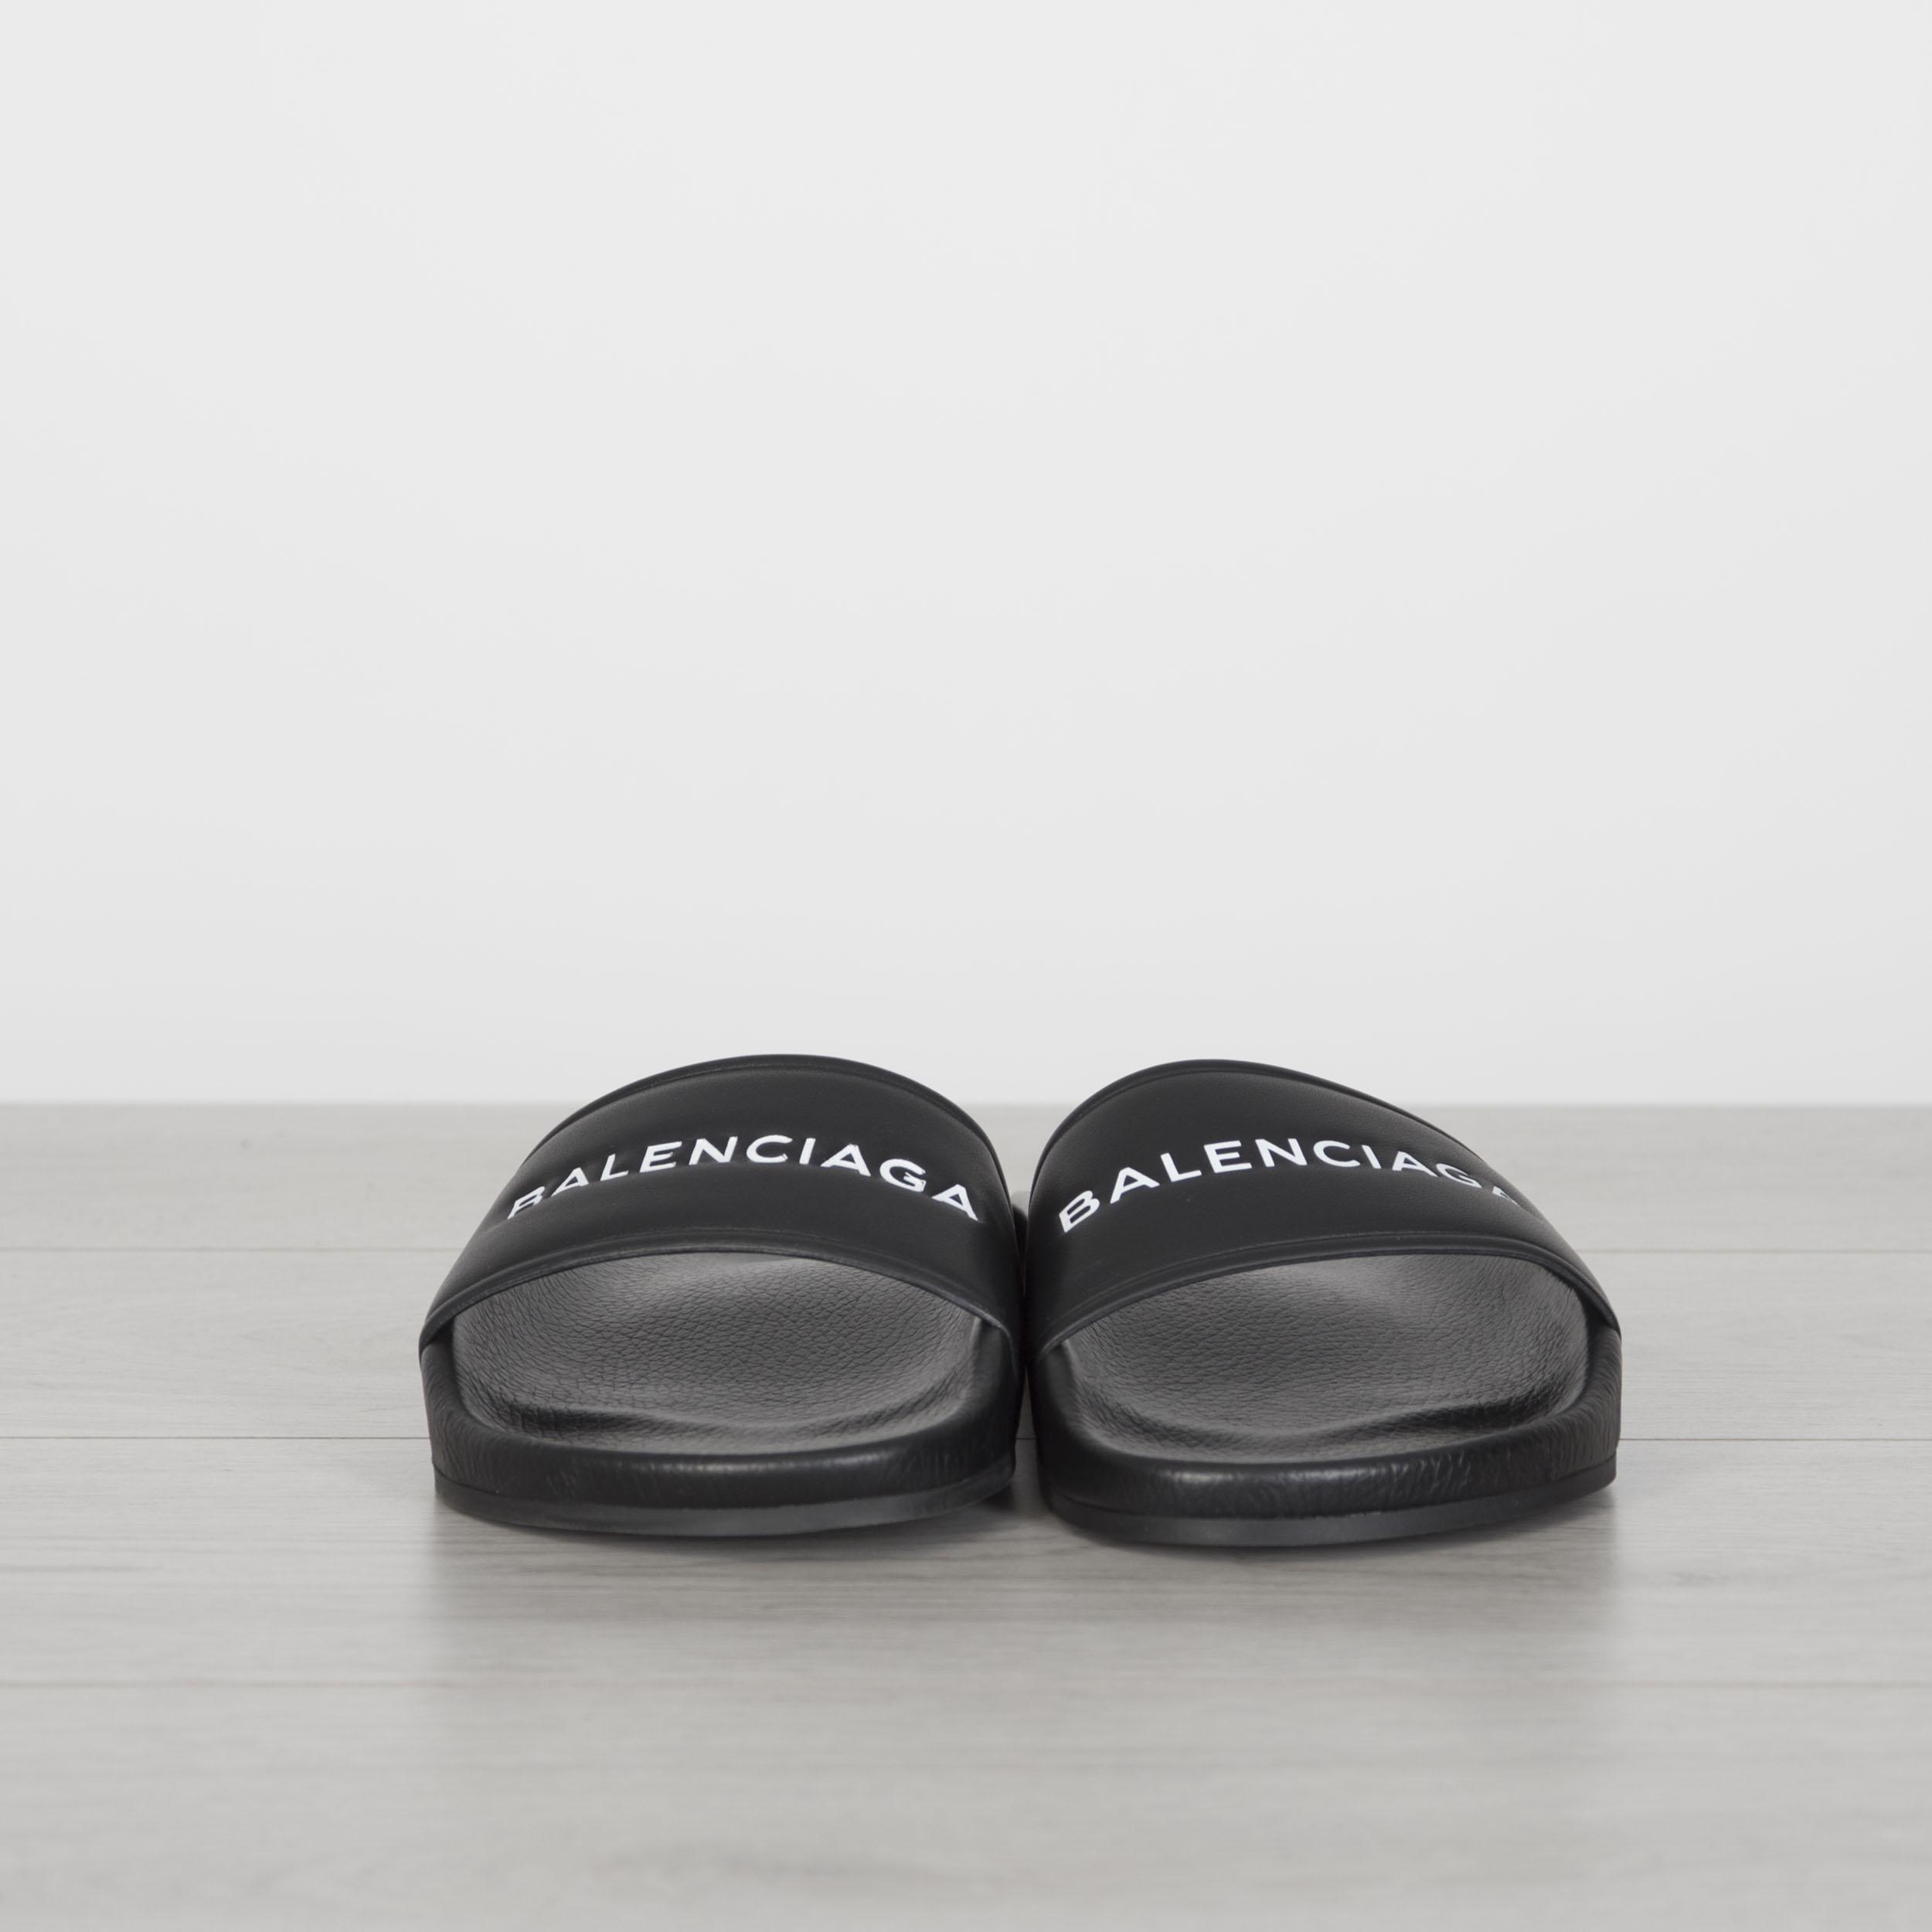 ada819d825e6 BALENCIAGA 575  Authentic New Black Leather Logo Print Slide Sandals ...